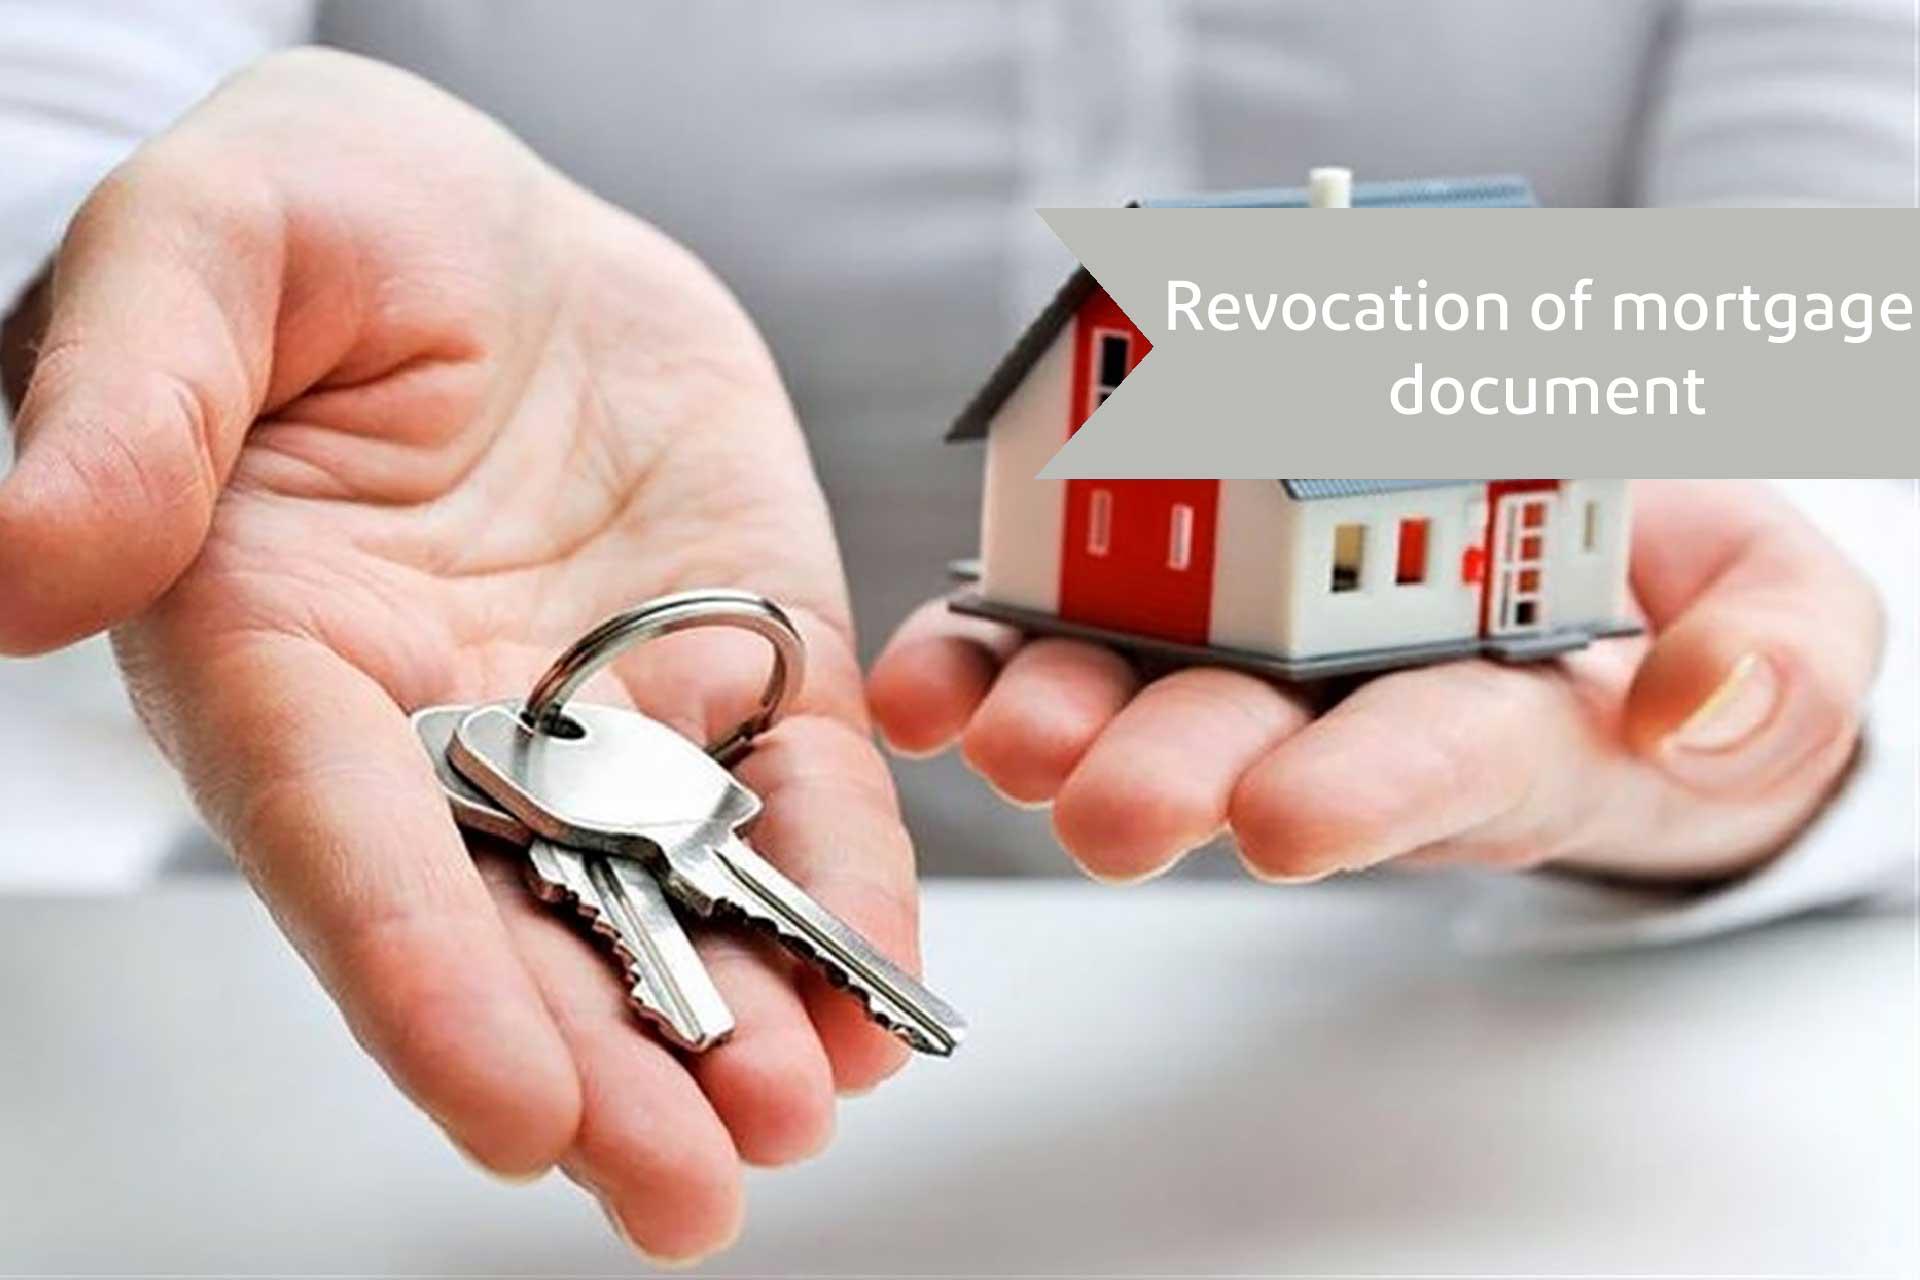 Revocation of mortgage document-alemohamad